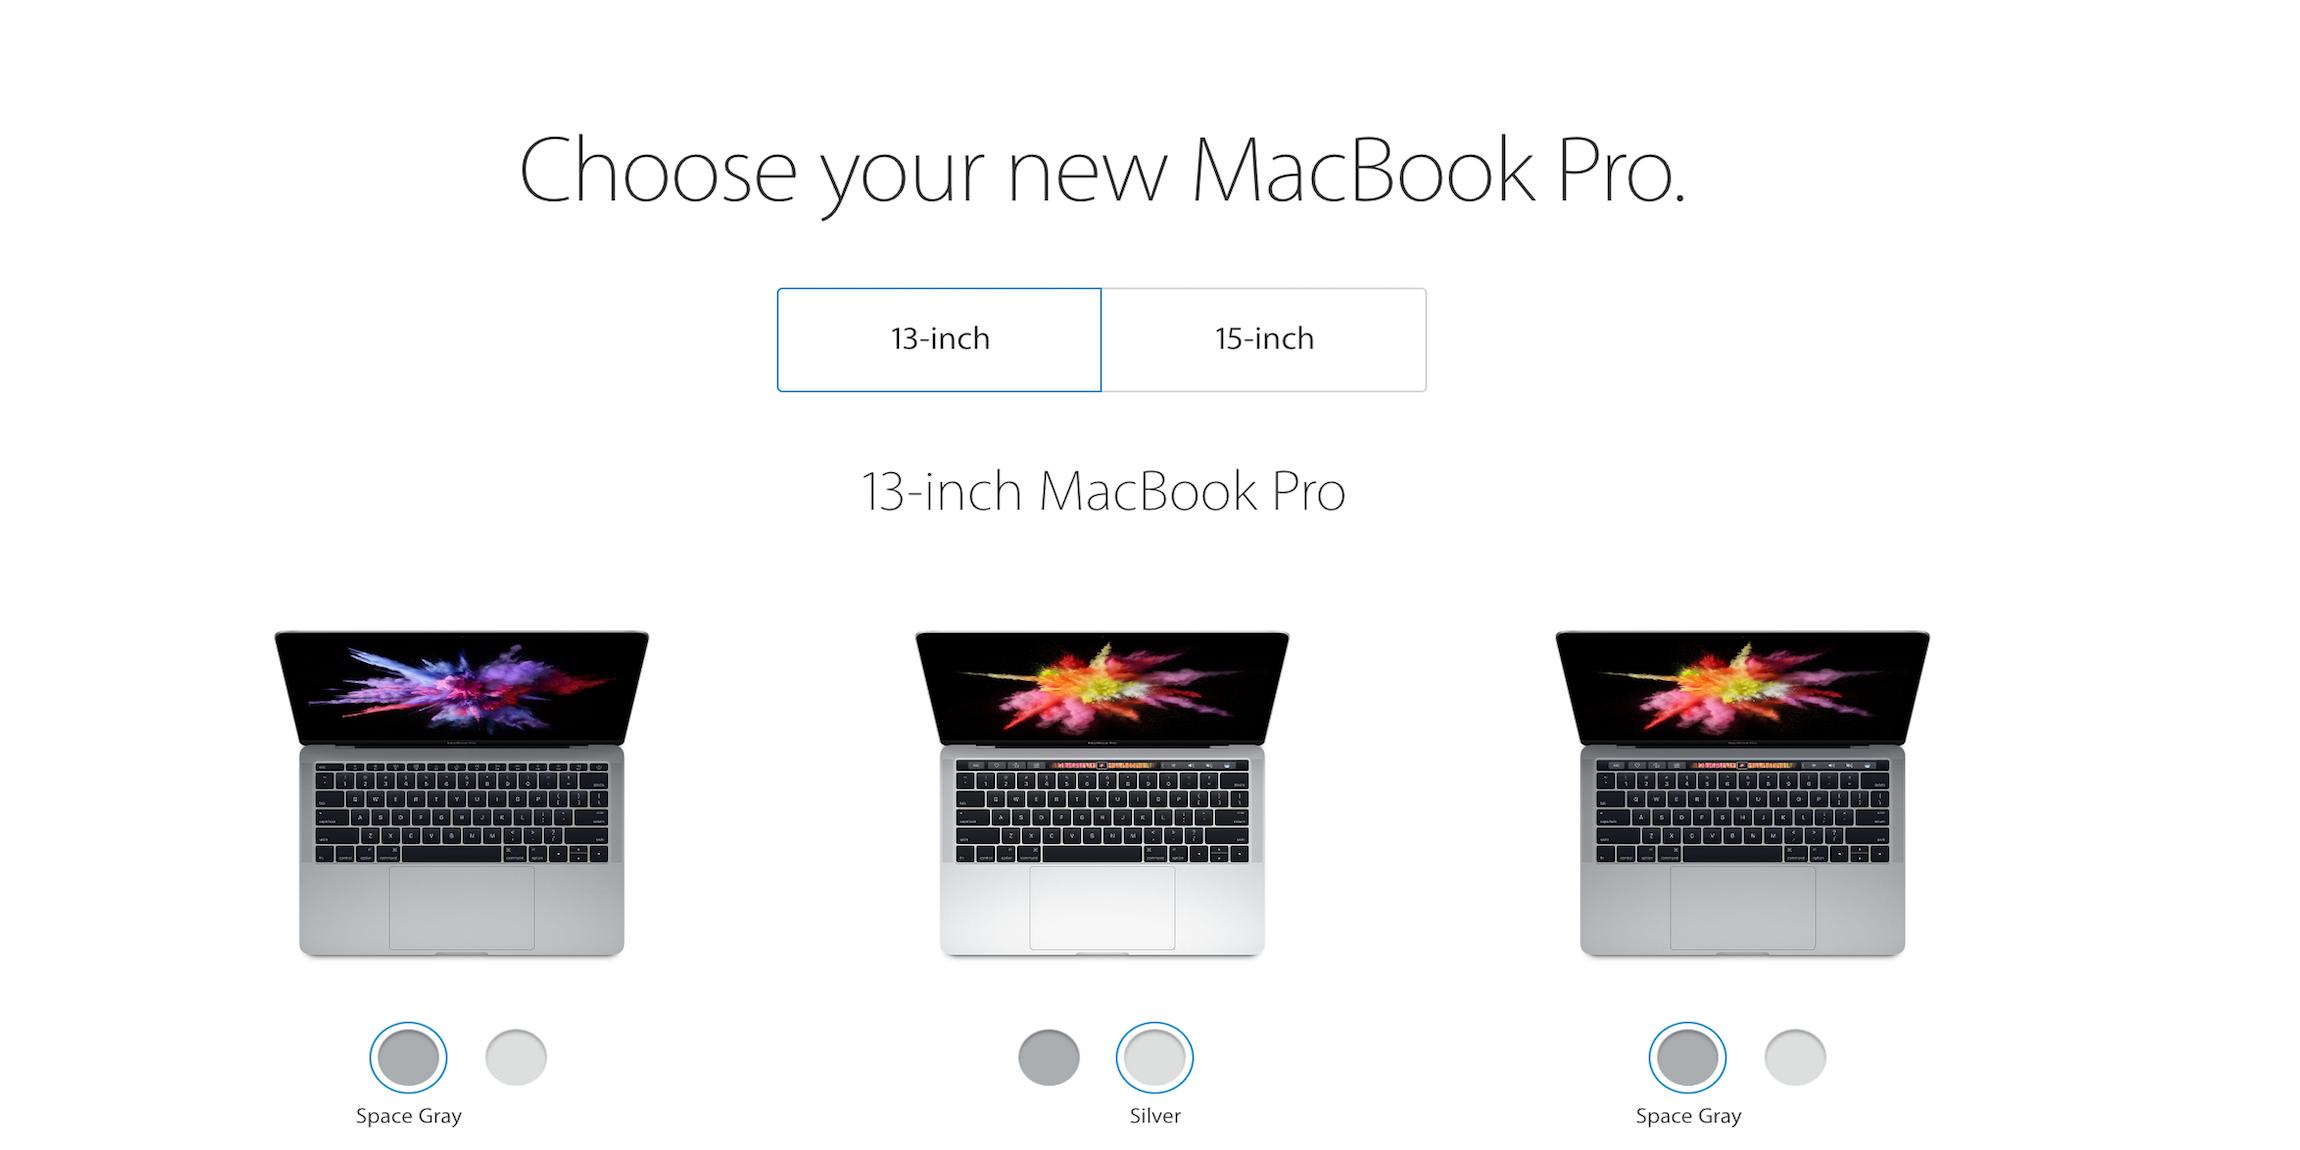 macbook-pros-2016